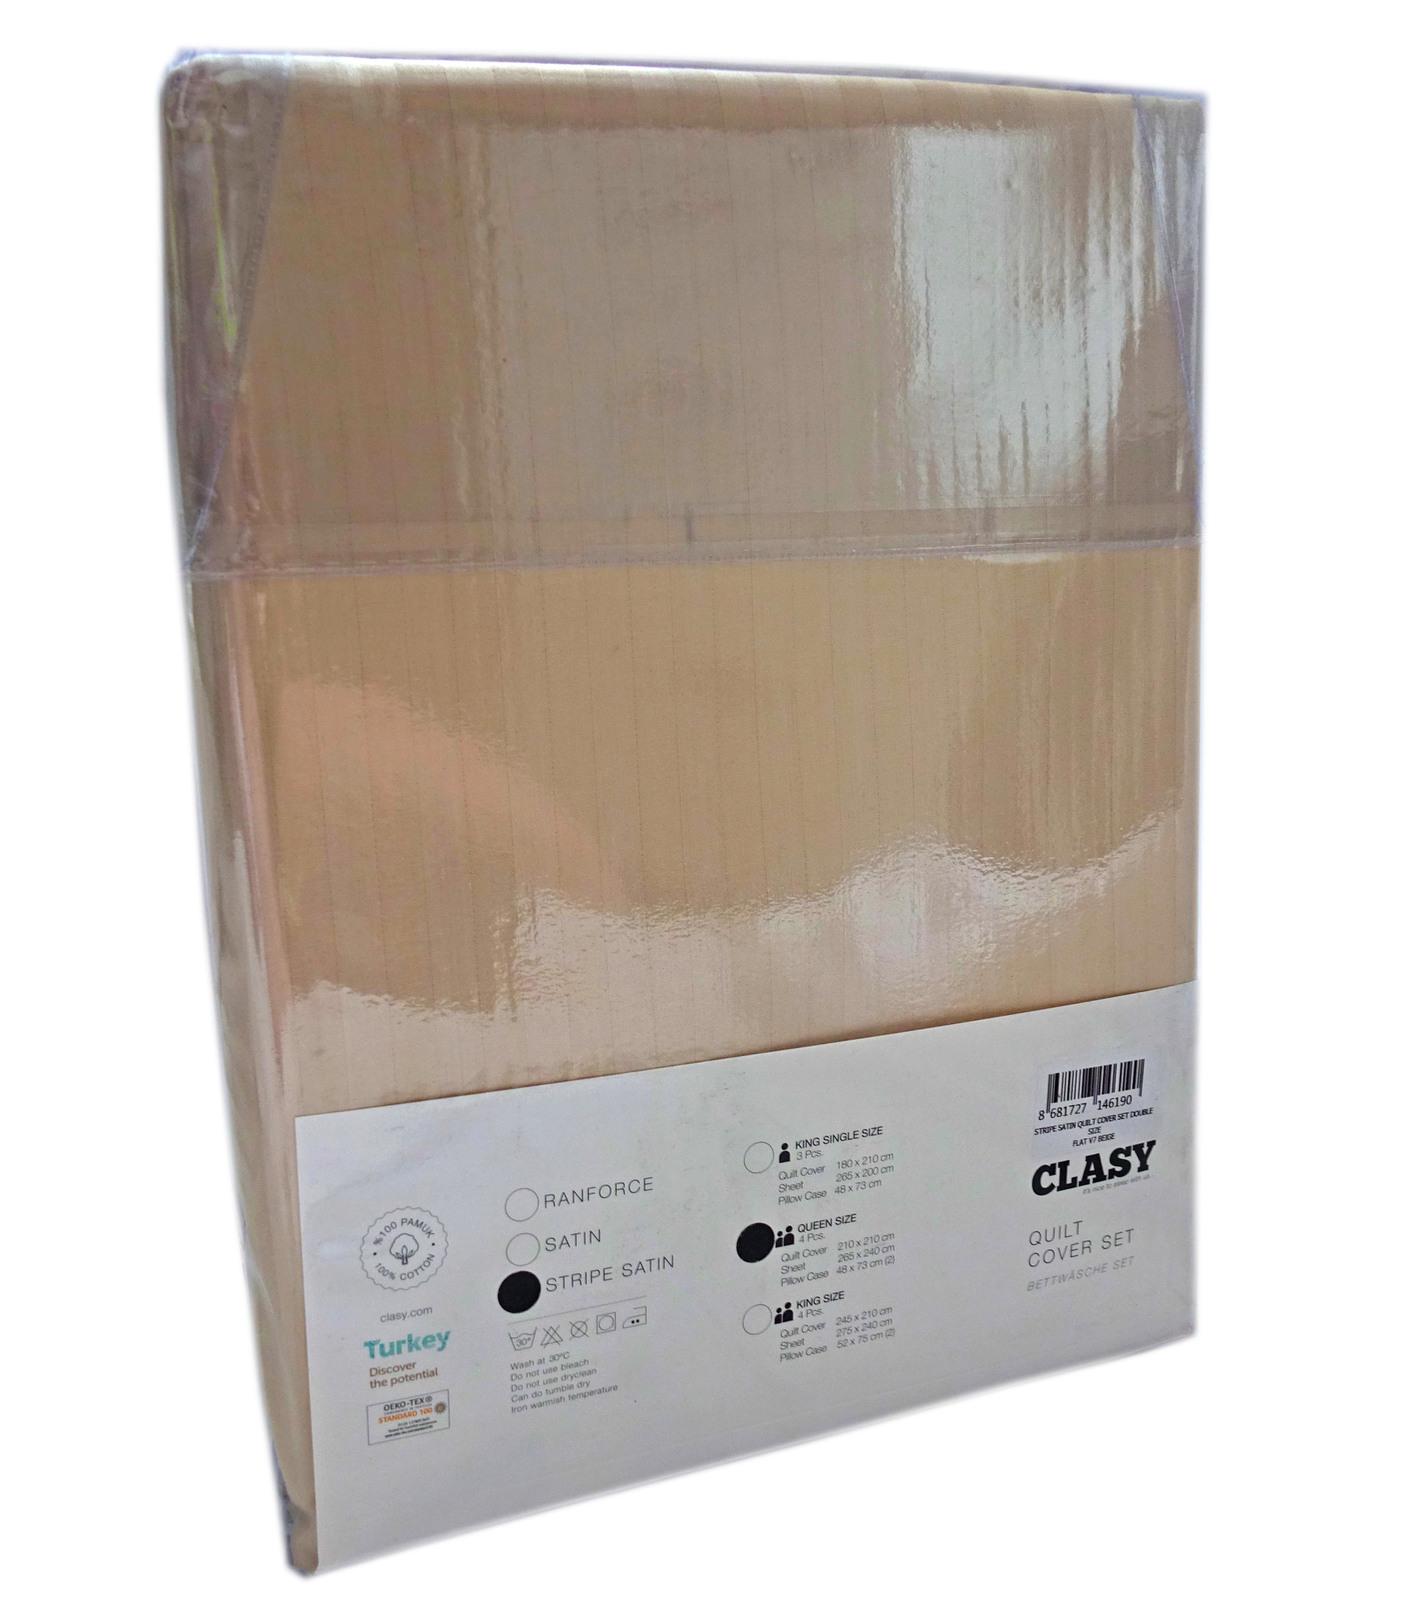 Clasy: Stripe Satin Duvet Cover Set (Queen) image